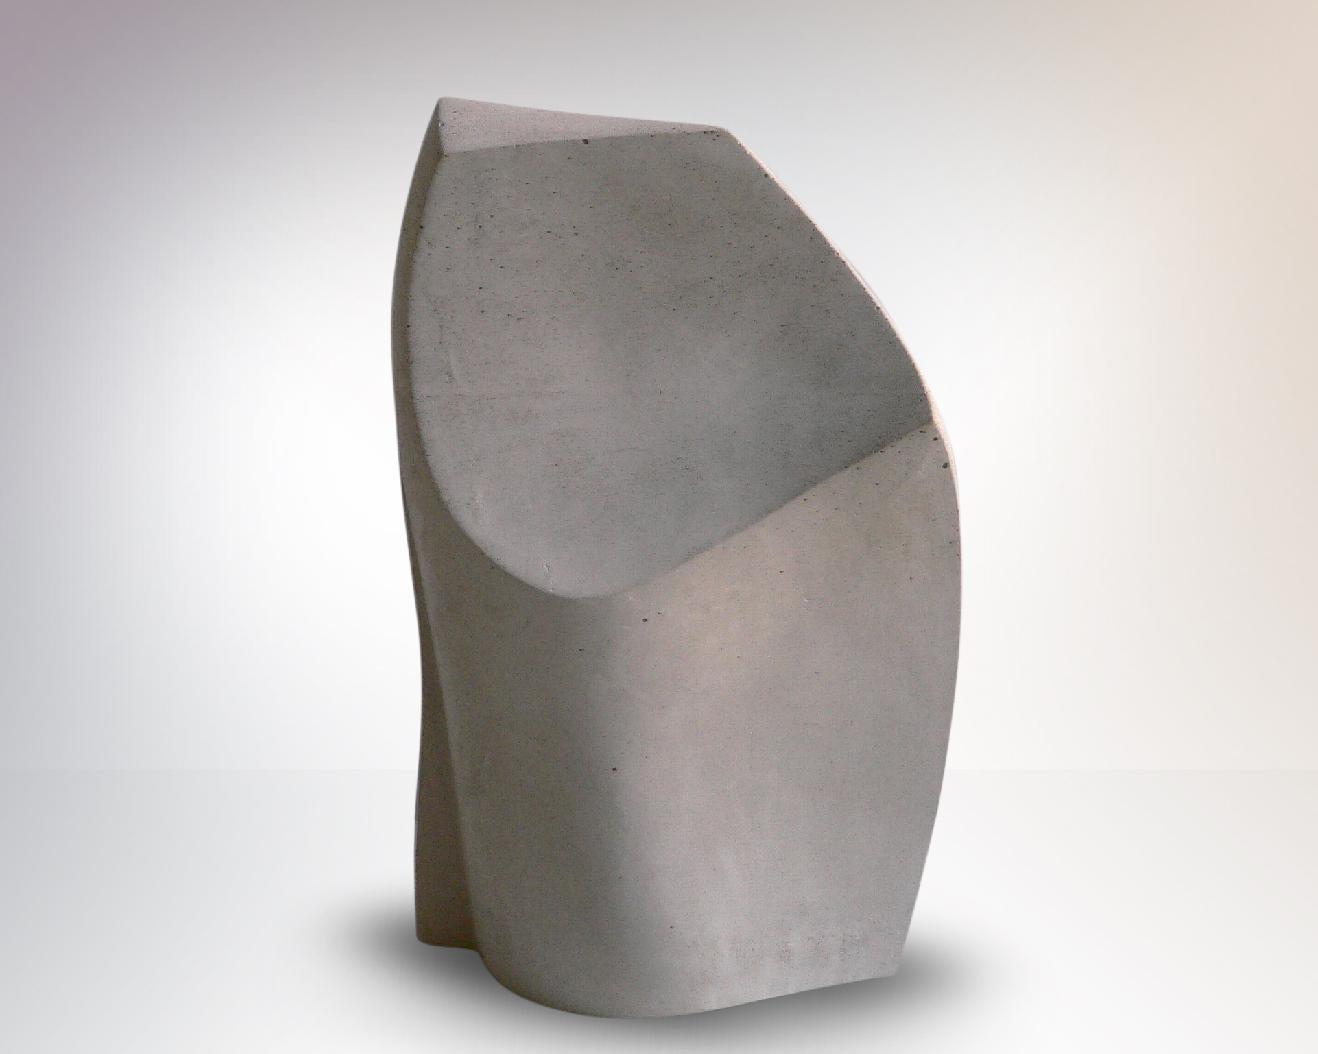 Concrete Sculpture 'Phönix II' by Carola Eggeling